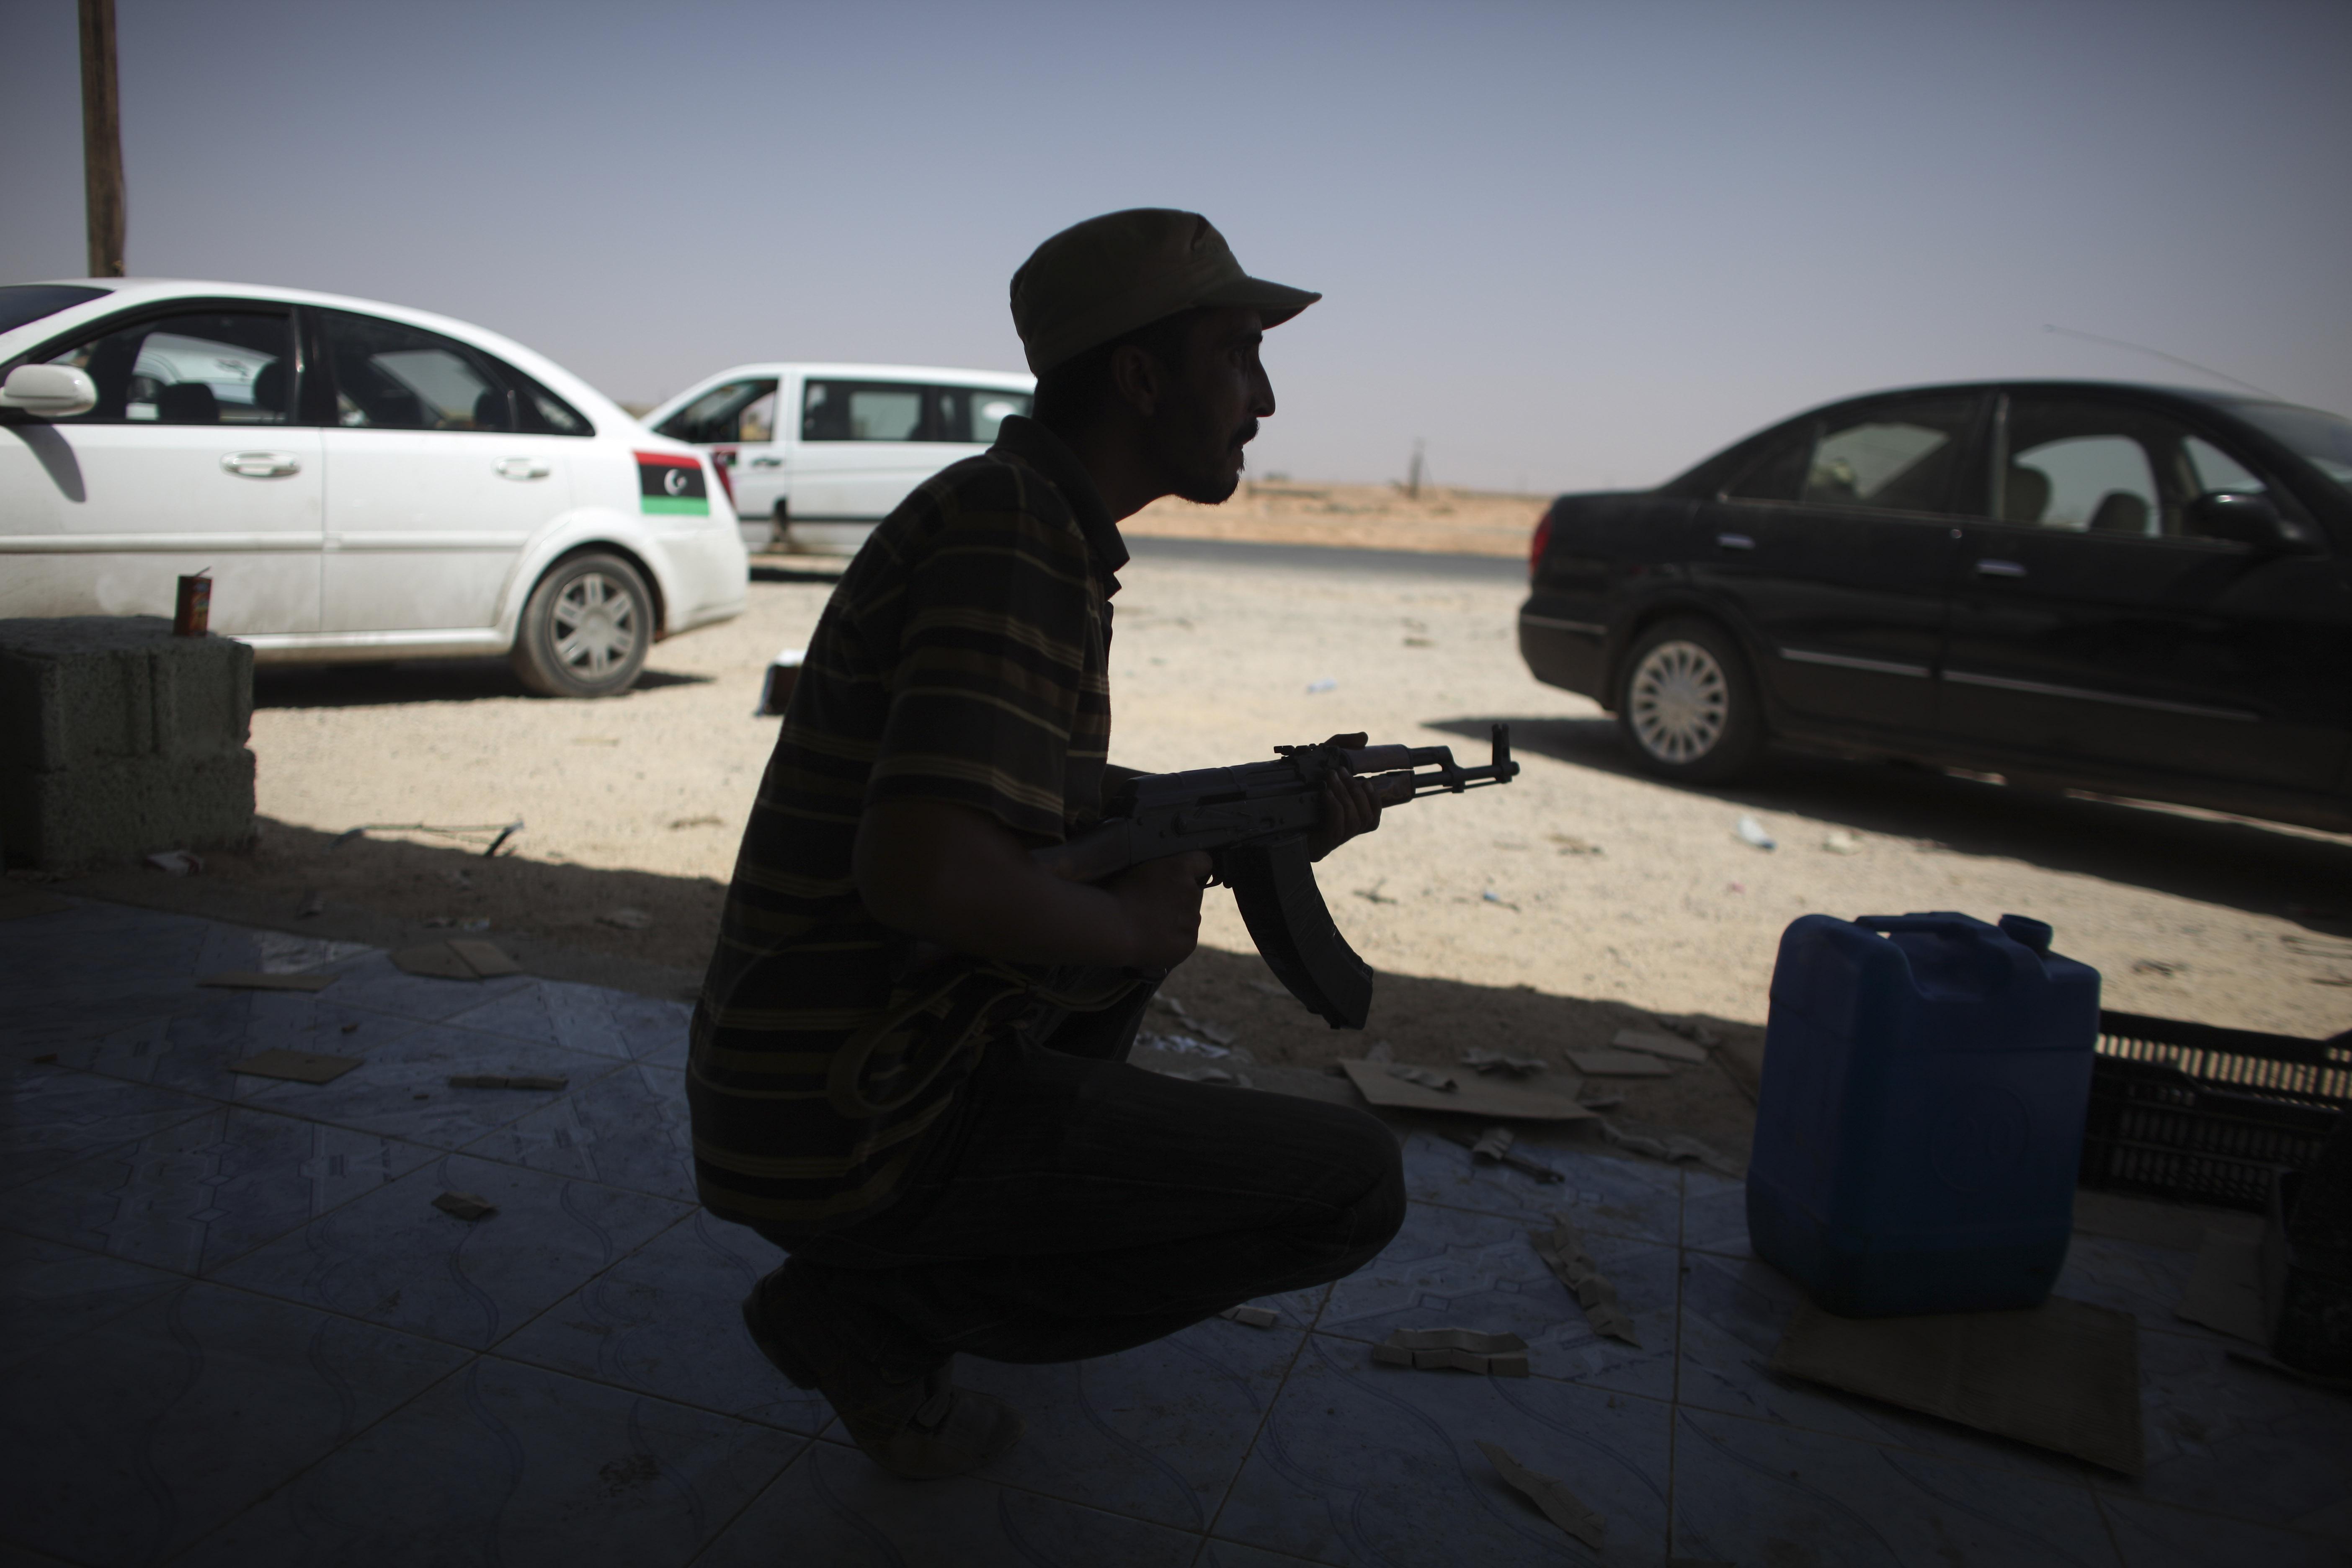 Libya's Arab Spring